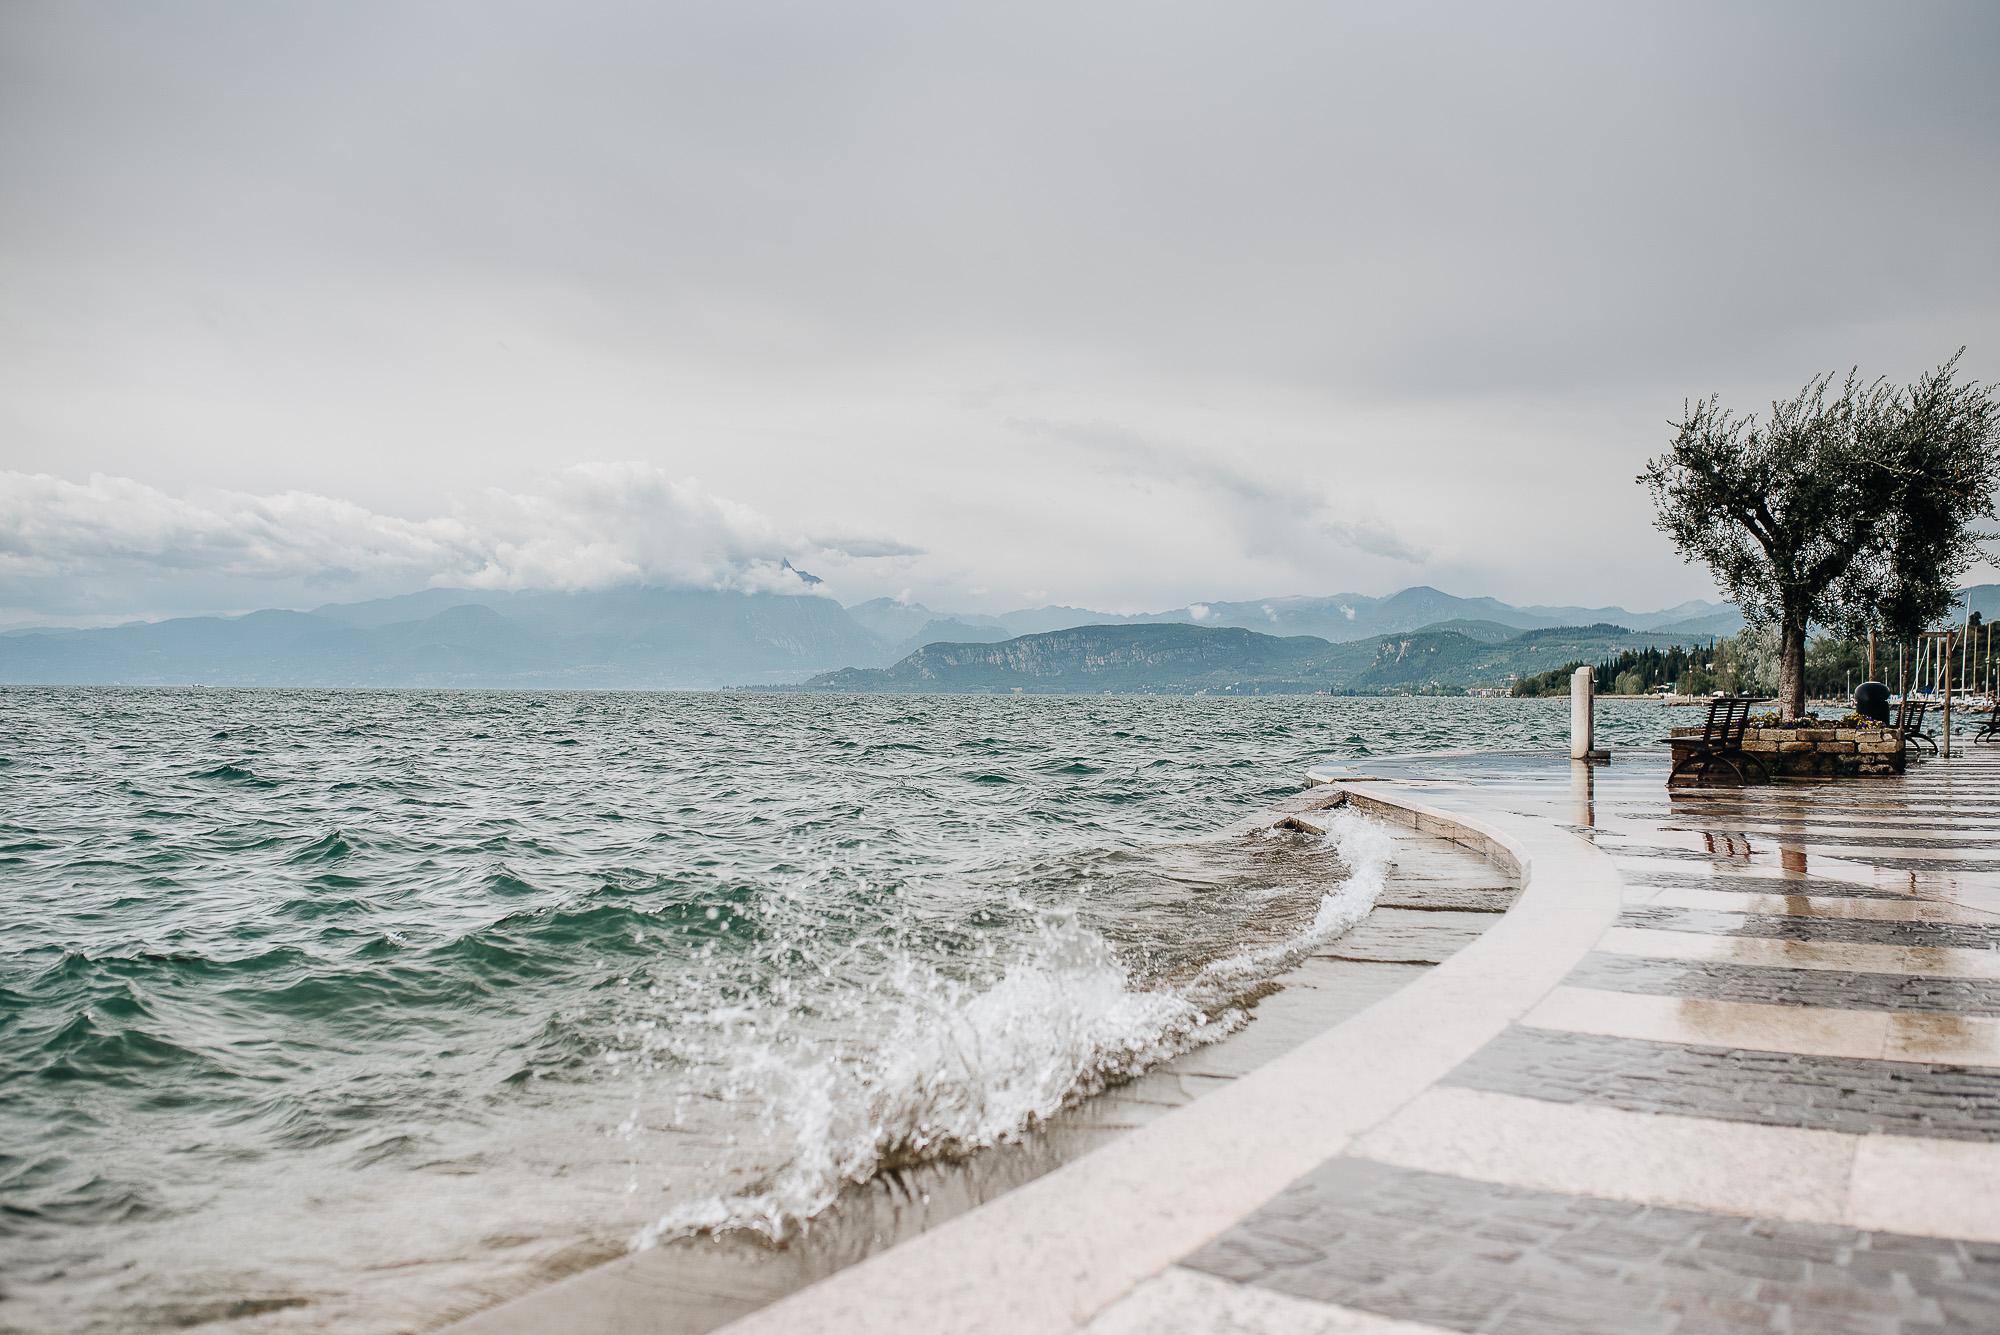 OurBeautifulAdventure-LakeGarda-Italy-Blog-1561.jpg